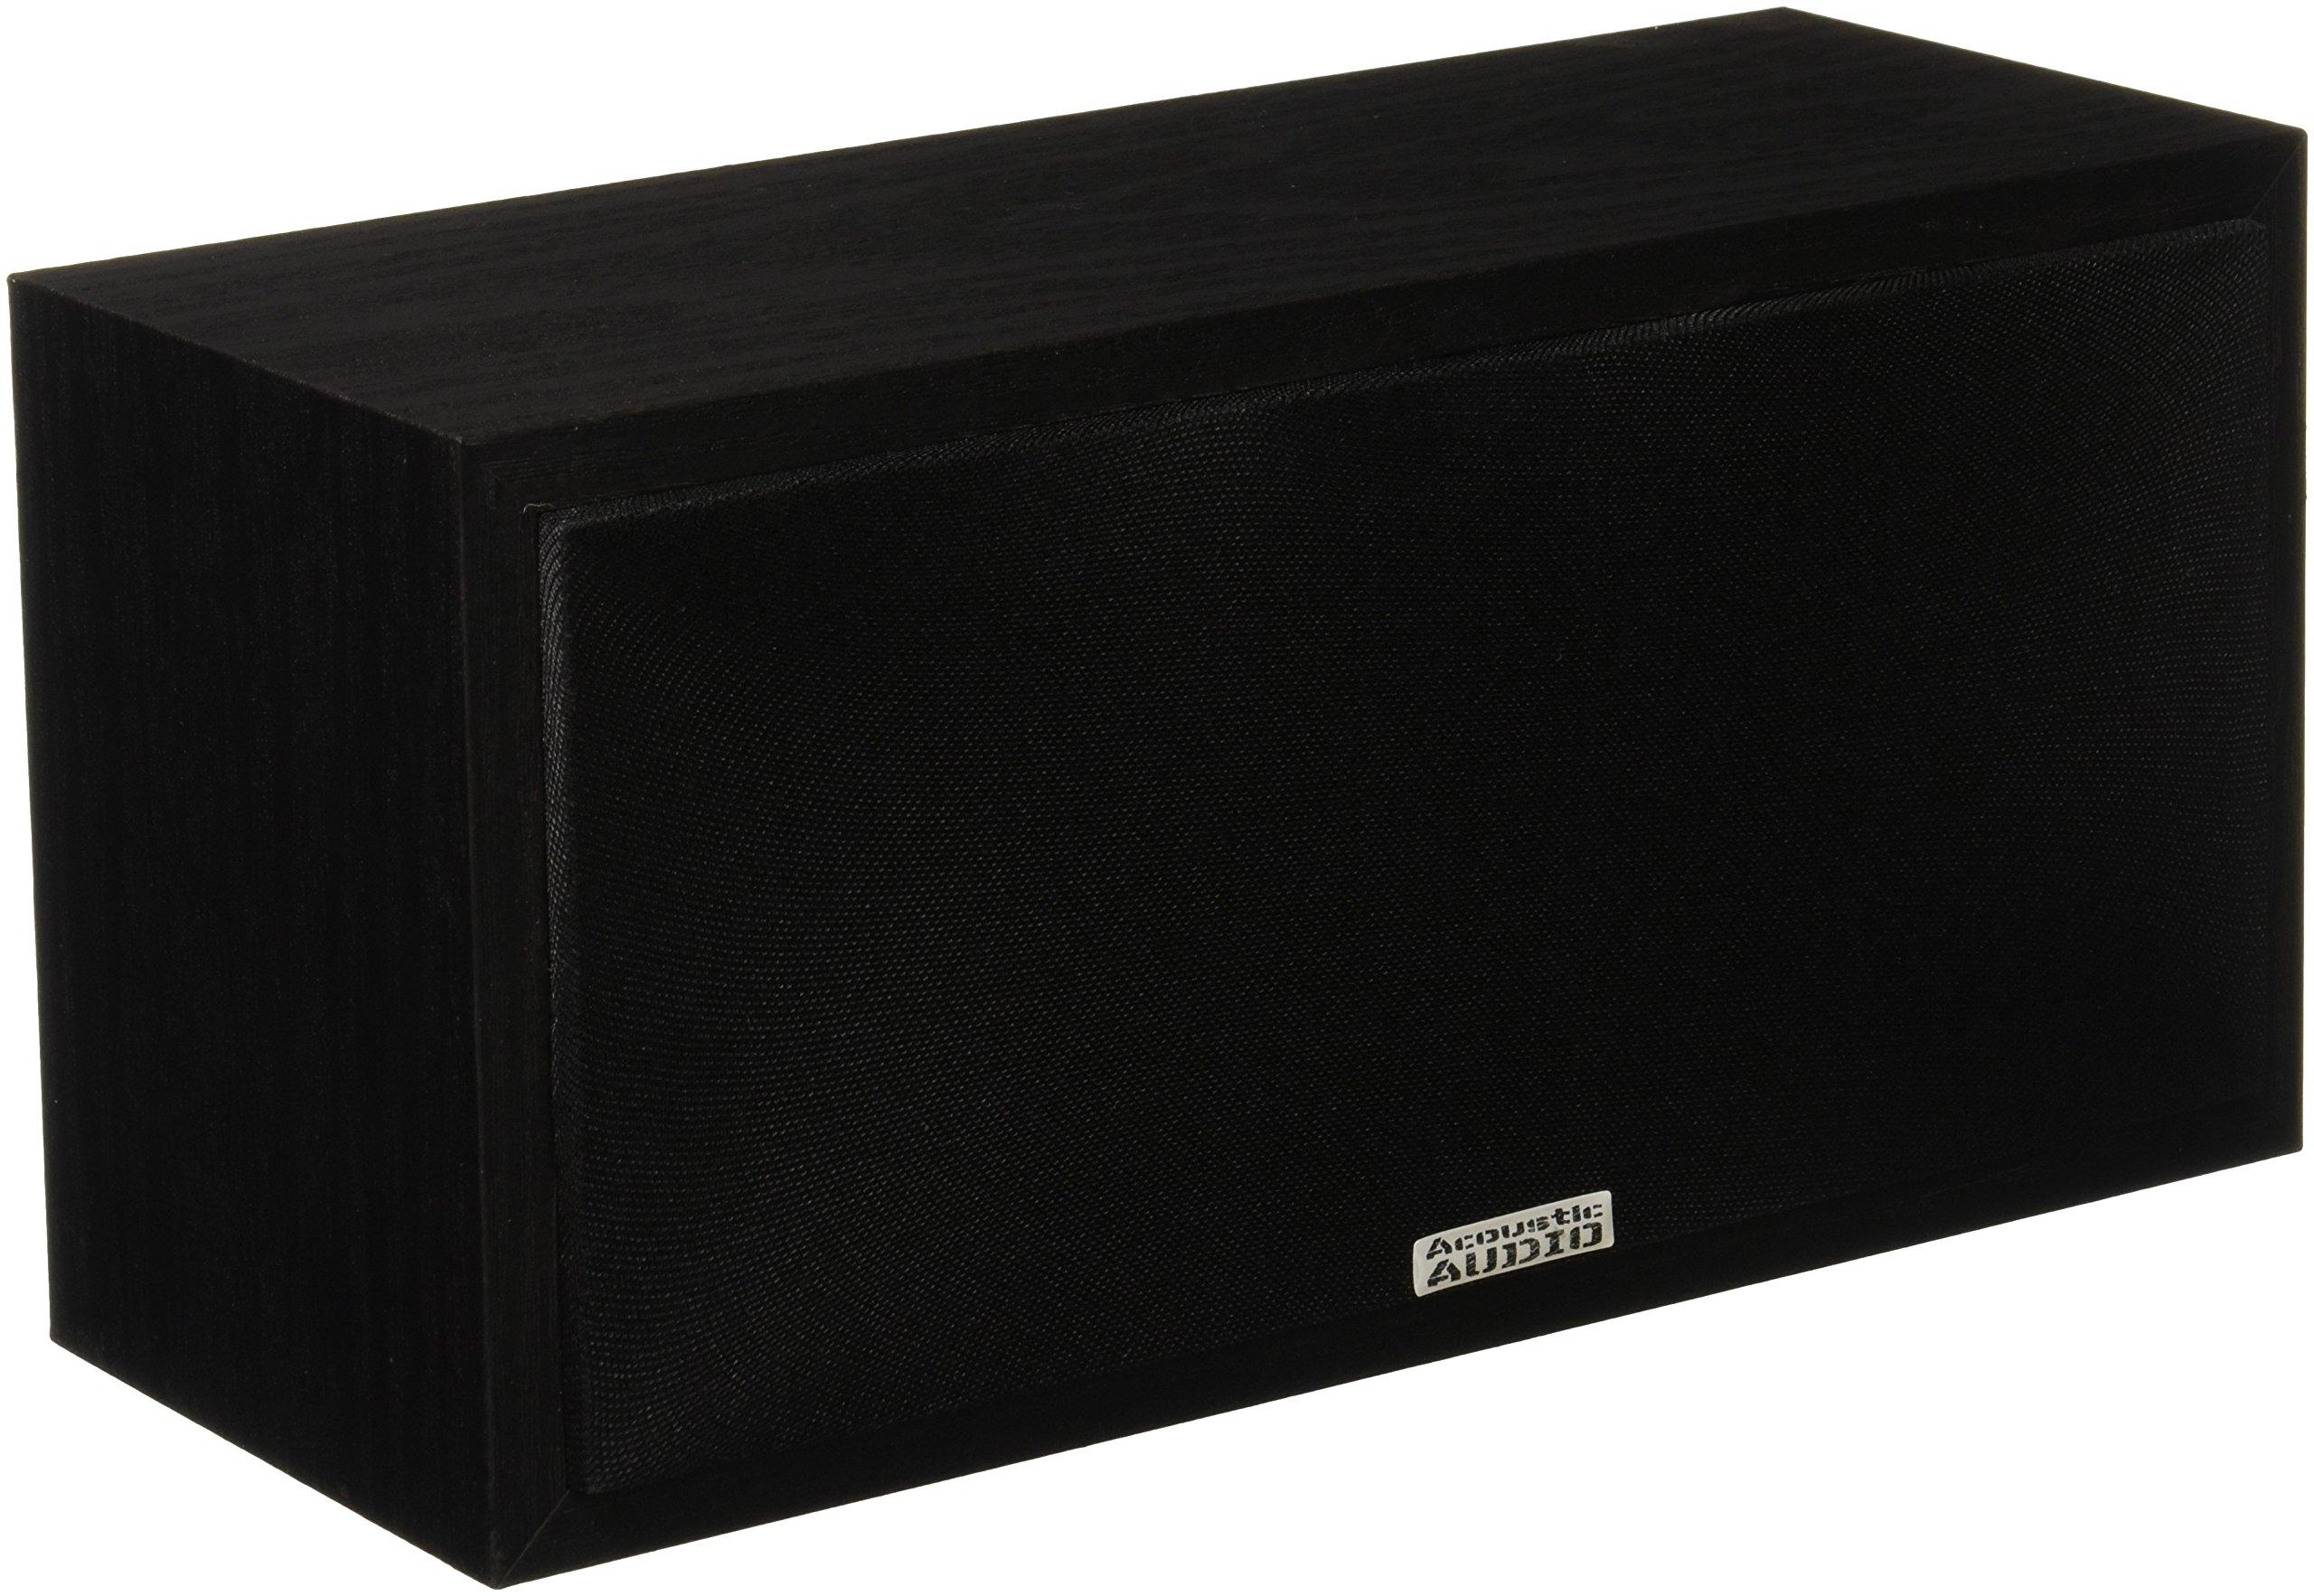 Acoustic Audio PSC-32 Center Channel Speaker (Black)